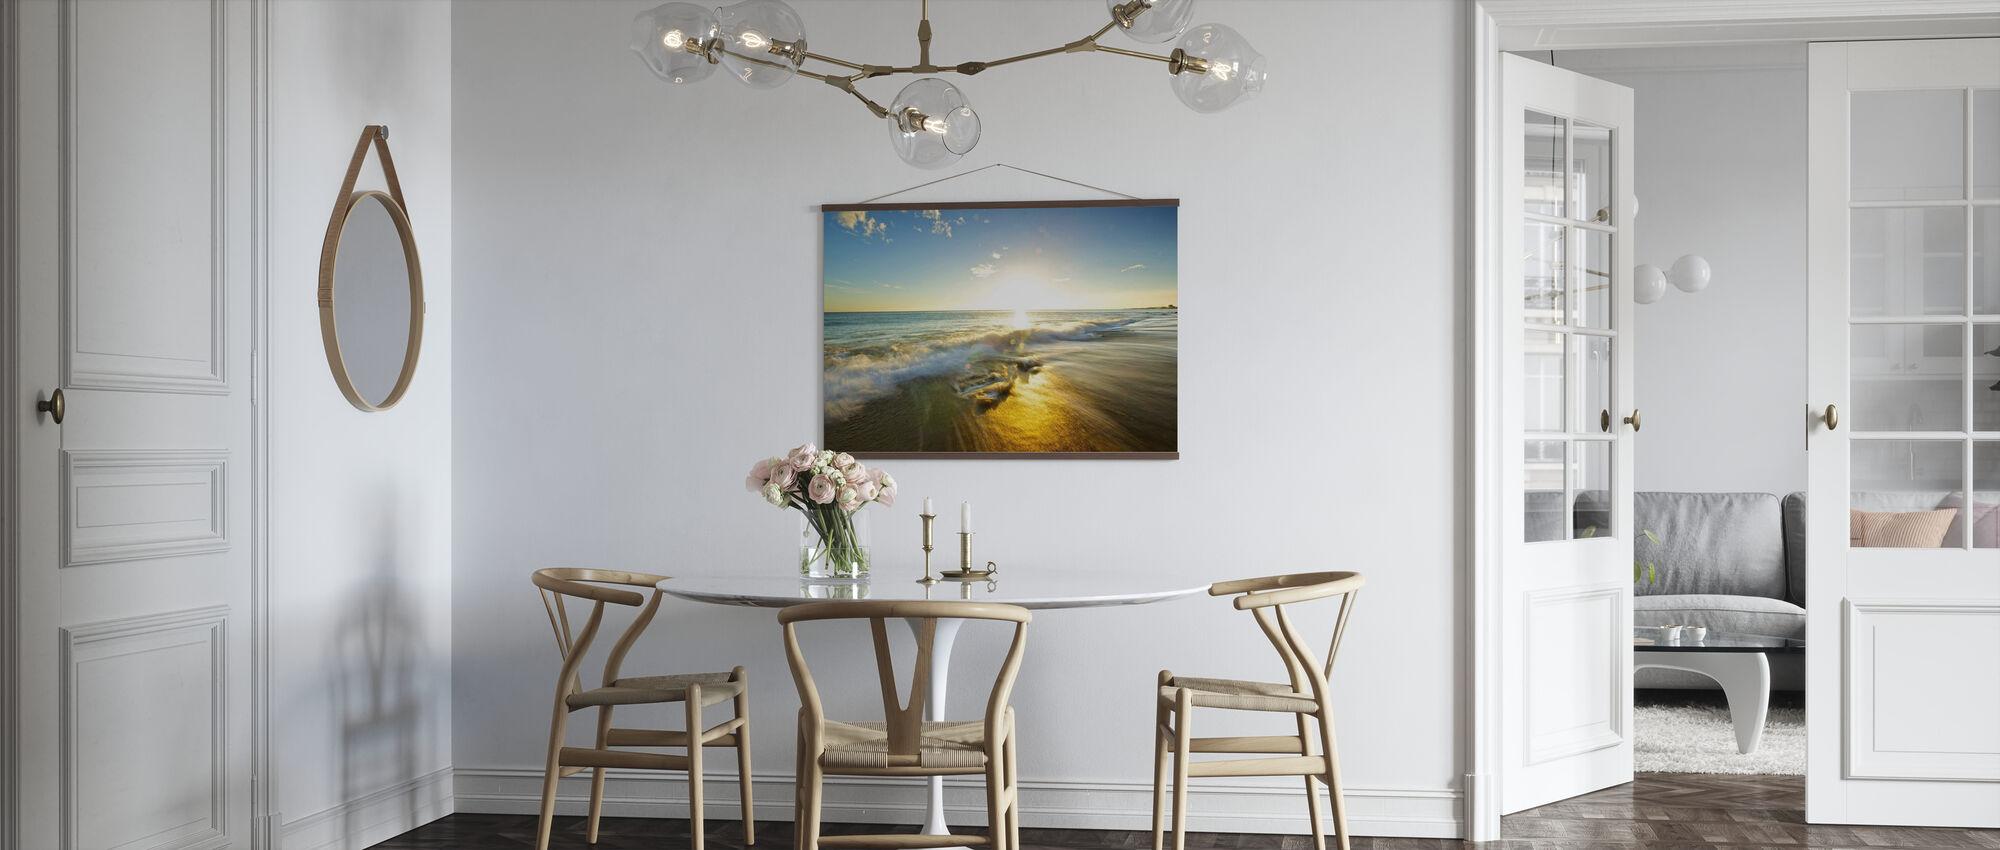 Golden Afternoon at Fangsheng - Poster - Kitchen